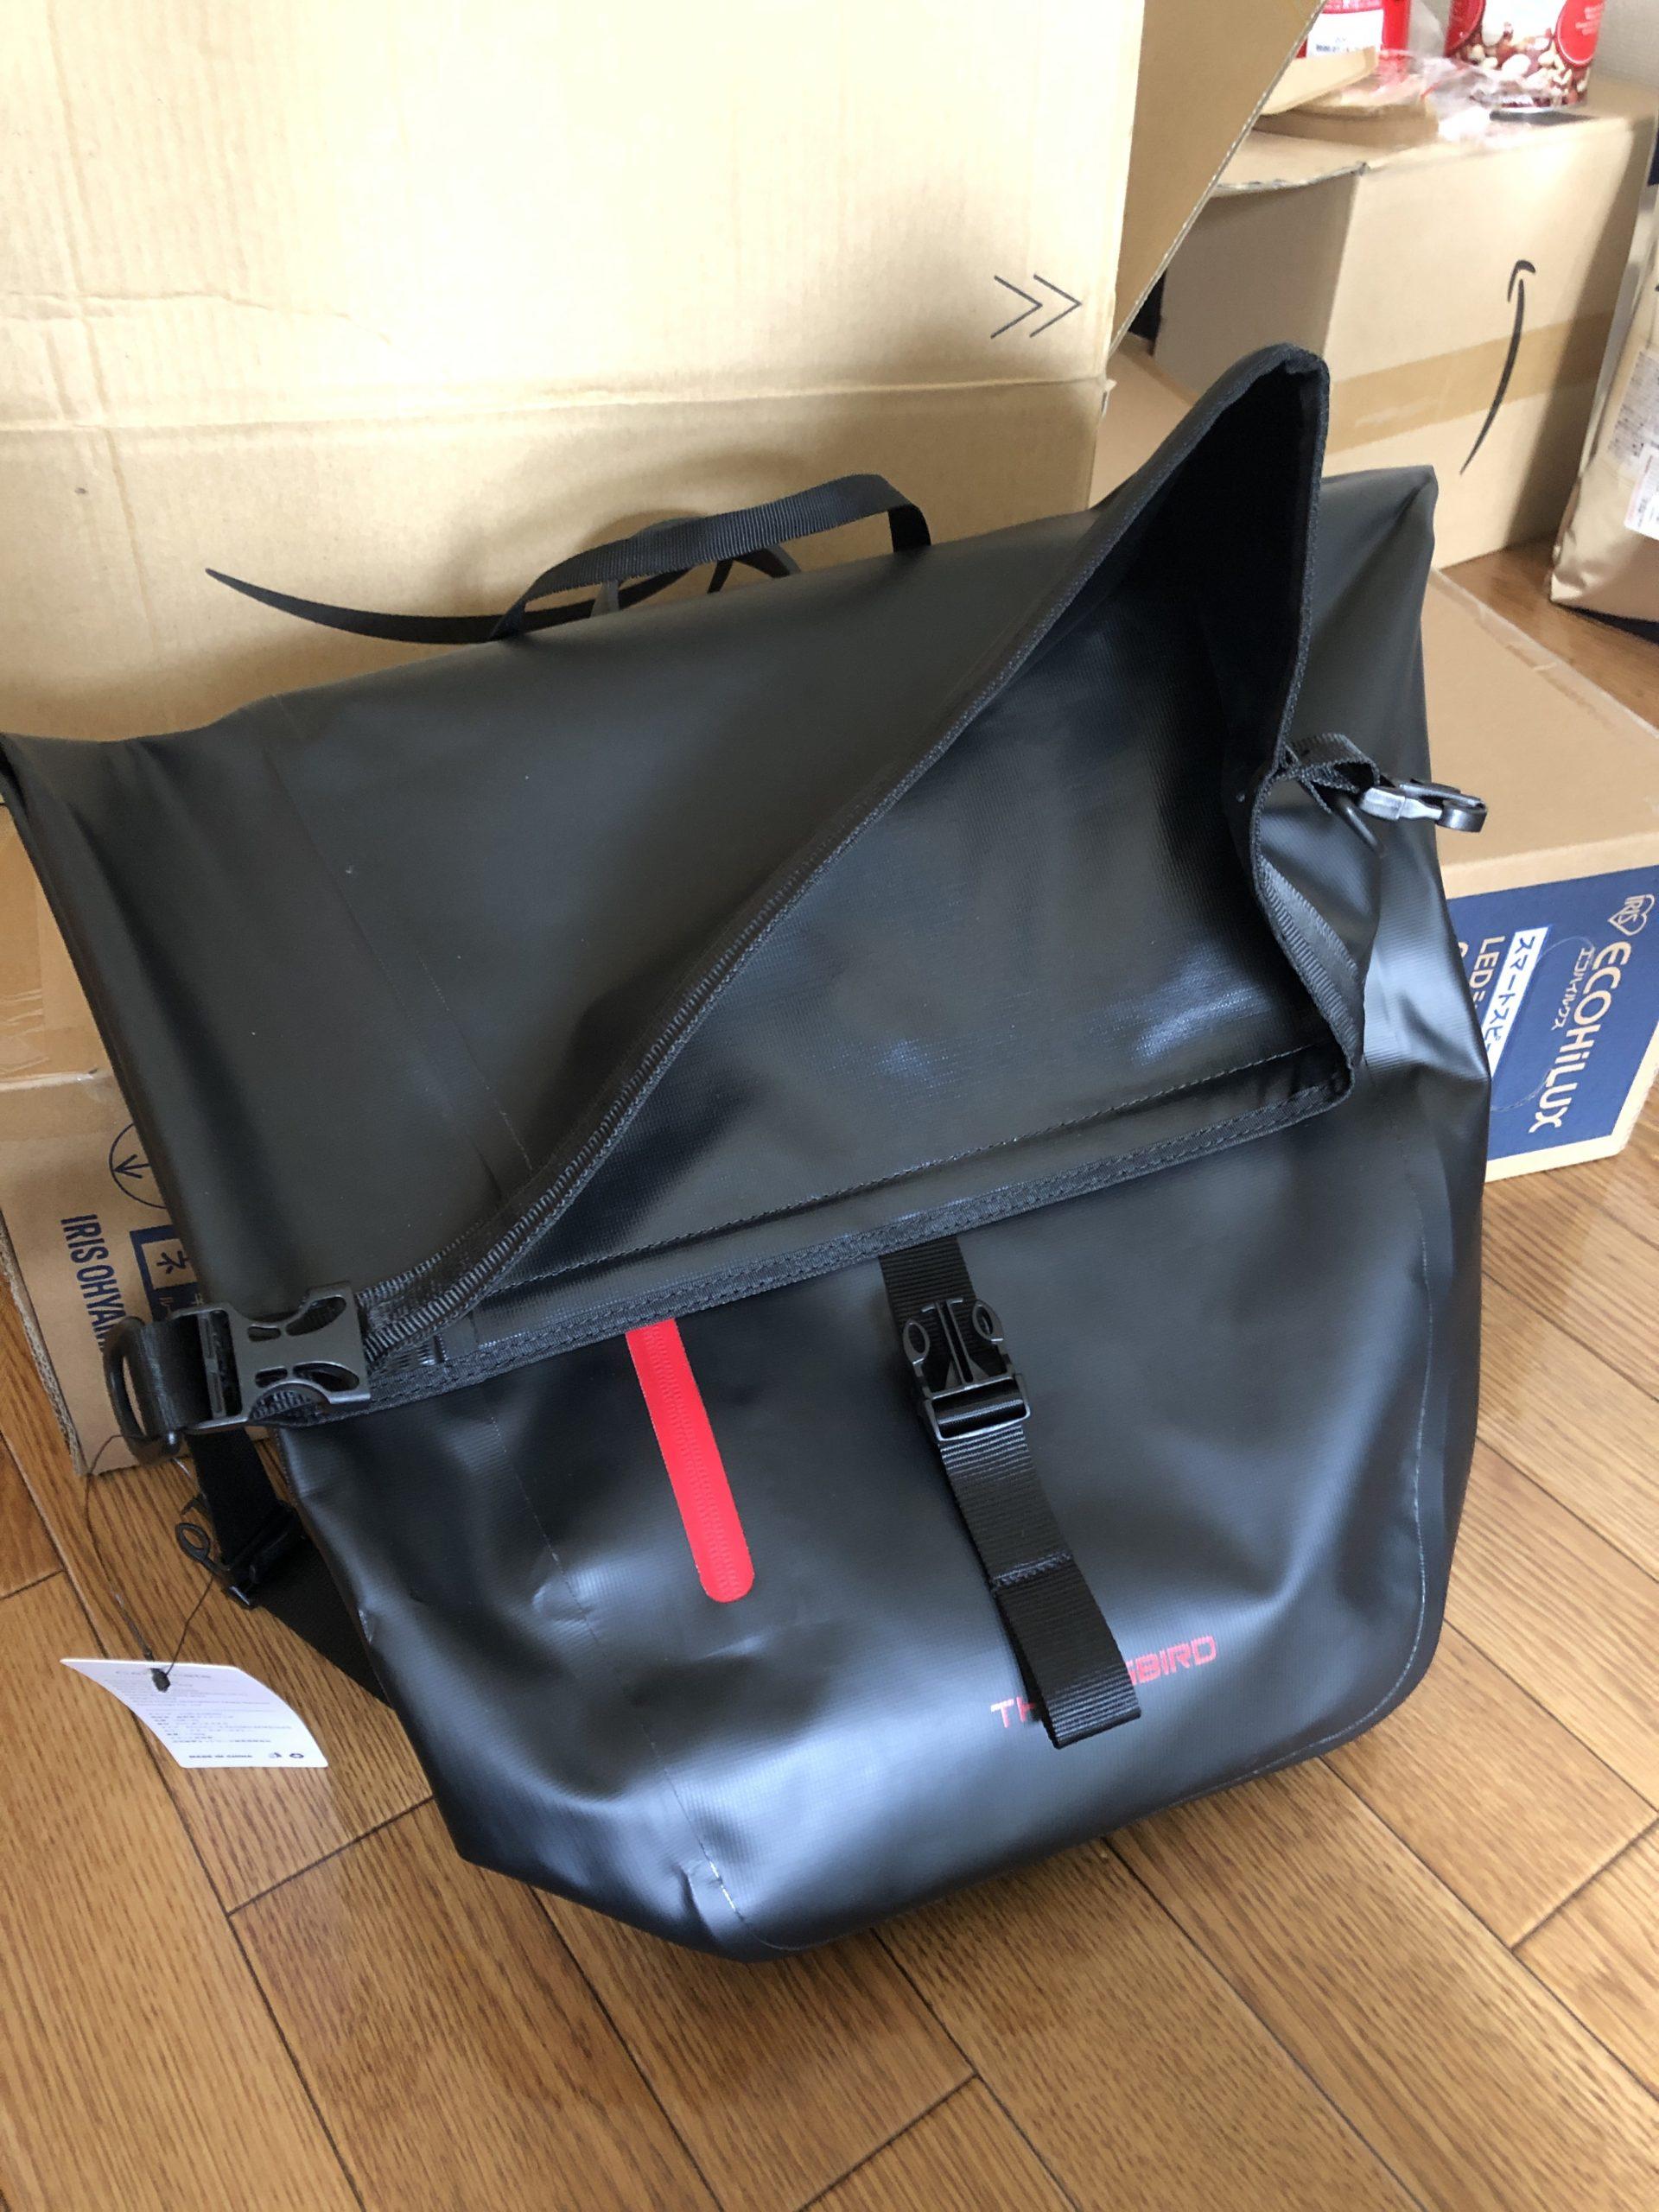 THRLEGBIRD pannier bag front img